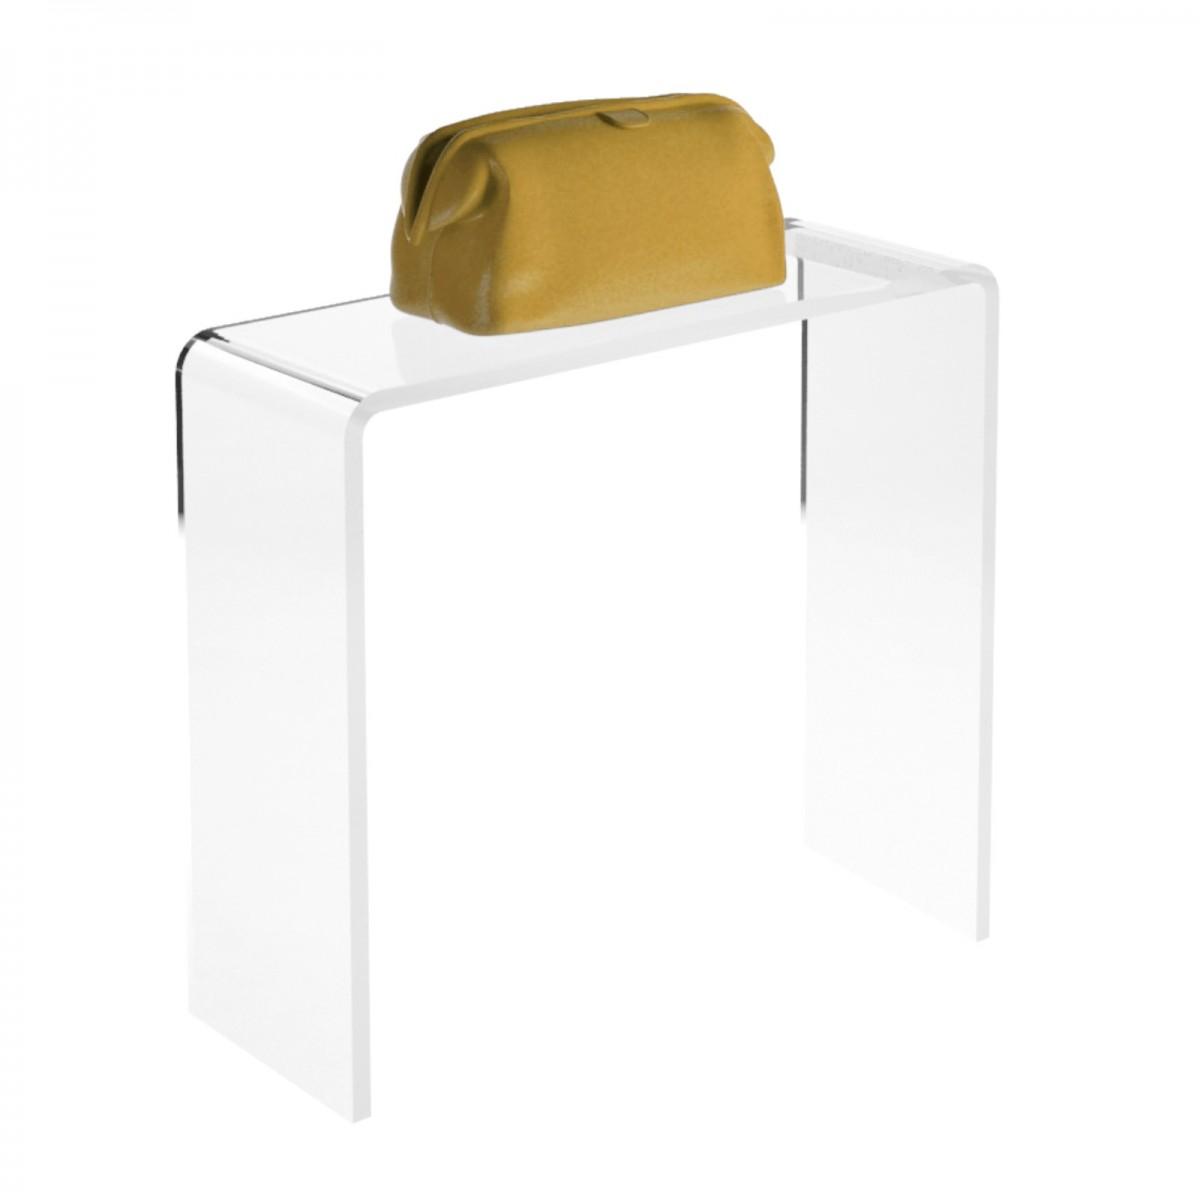 Tavolino plexiglass trasparente - Misure: 12 x 10 x H10 cm